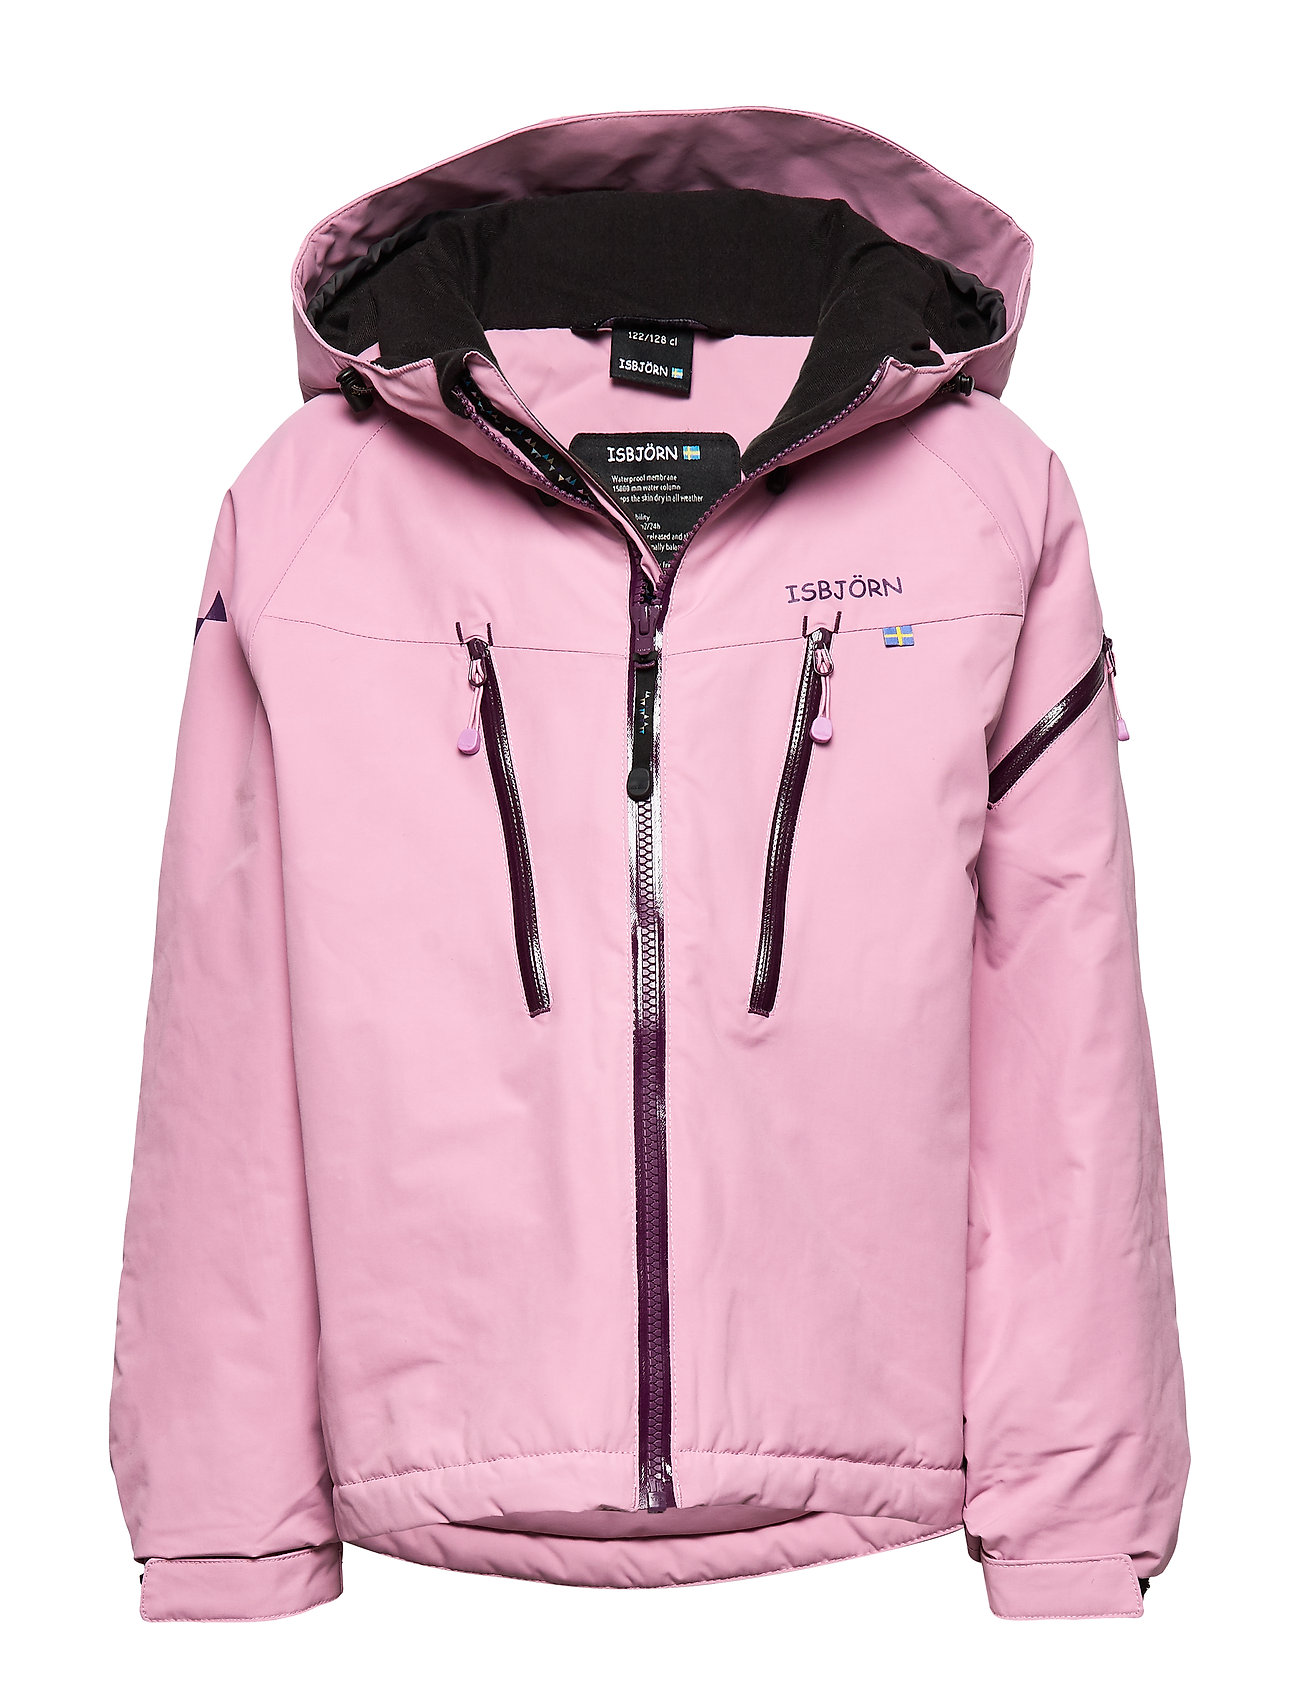 ISBJÖRN of Sweden CARVING Winter Jacket - DUSTY PINK